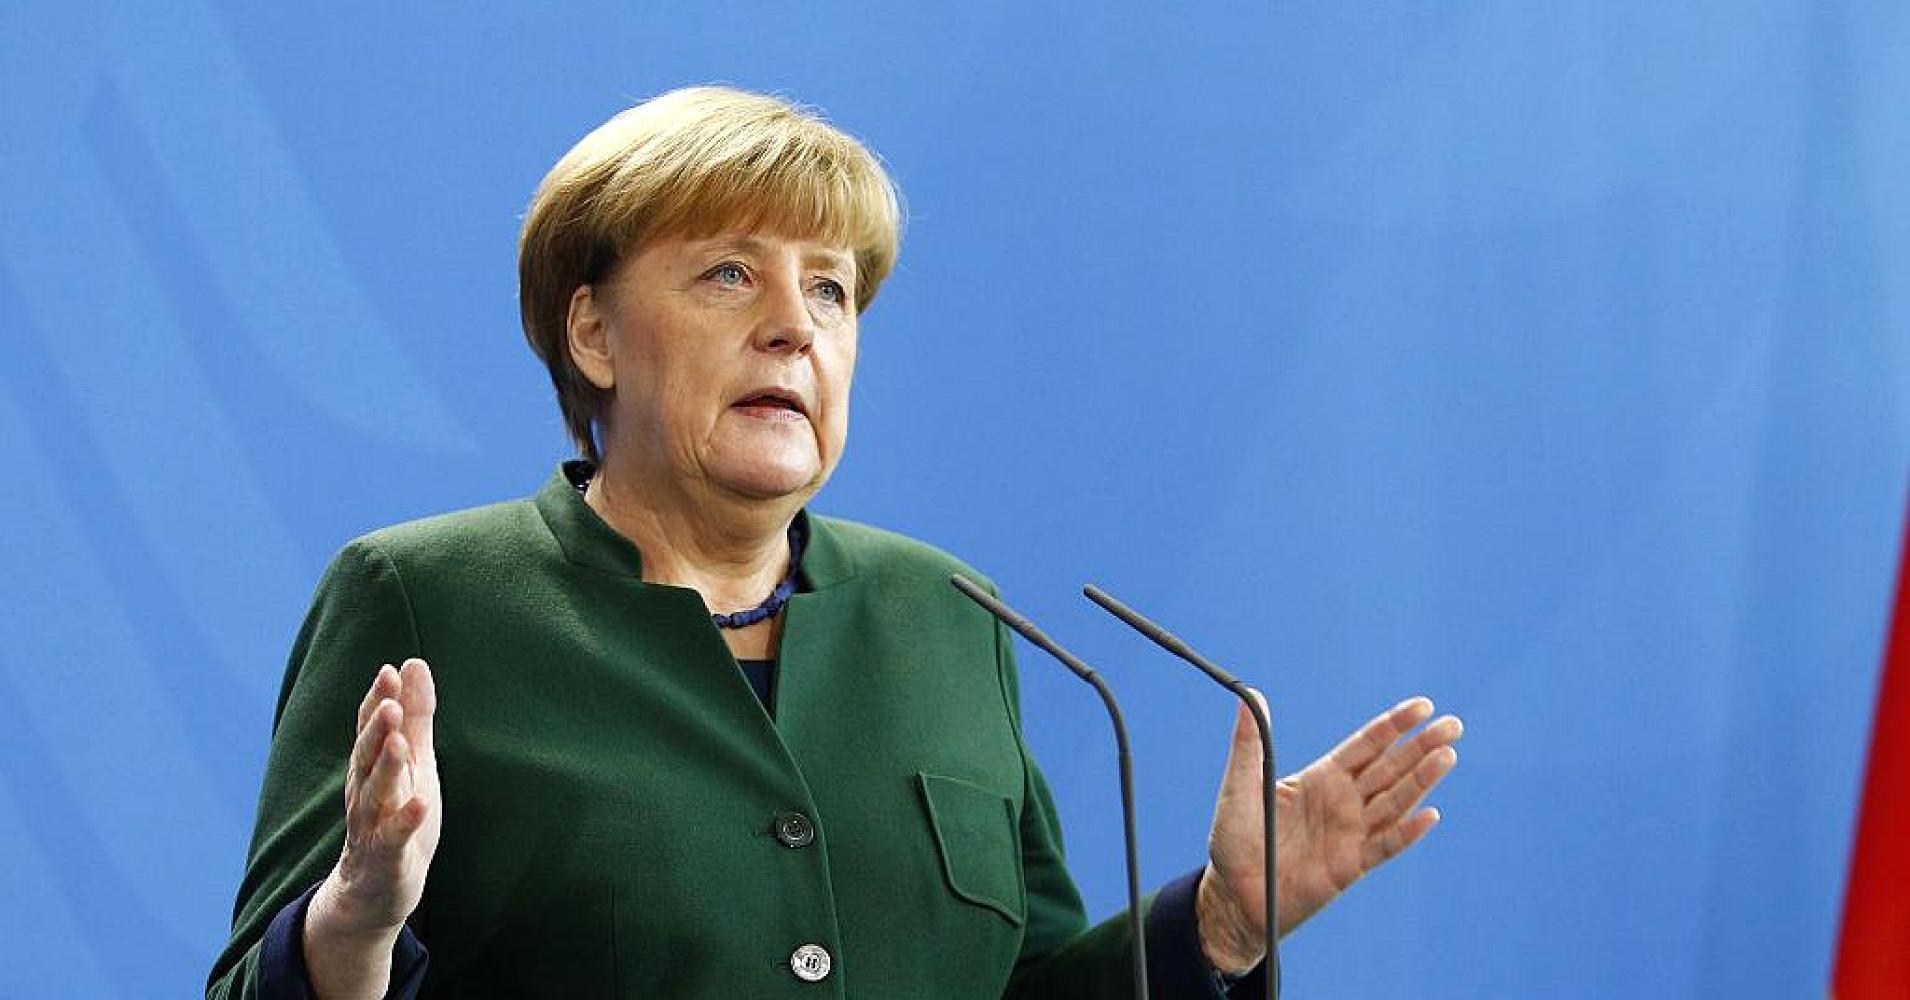 German Chancellor Merkel to visit Sofia, on Saturday